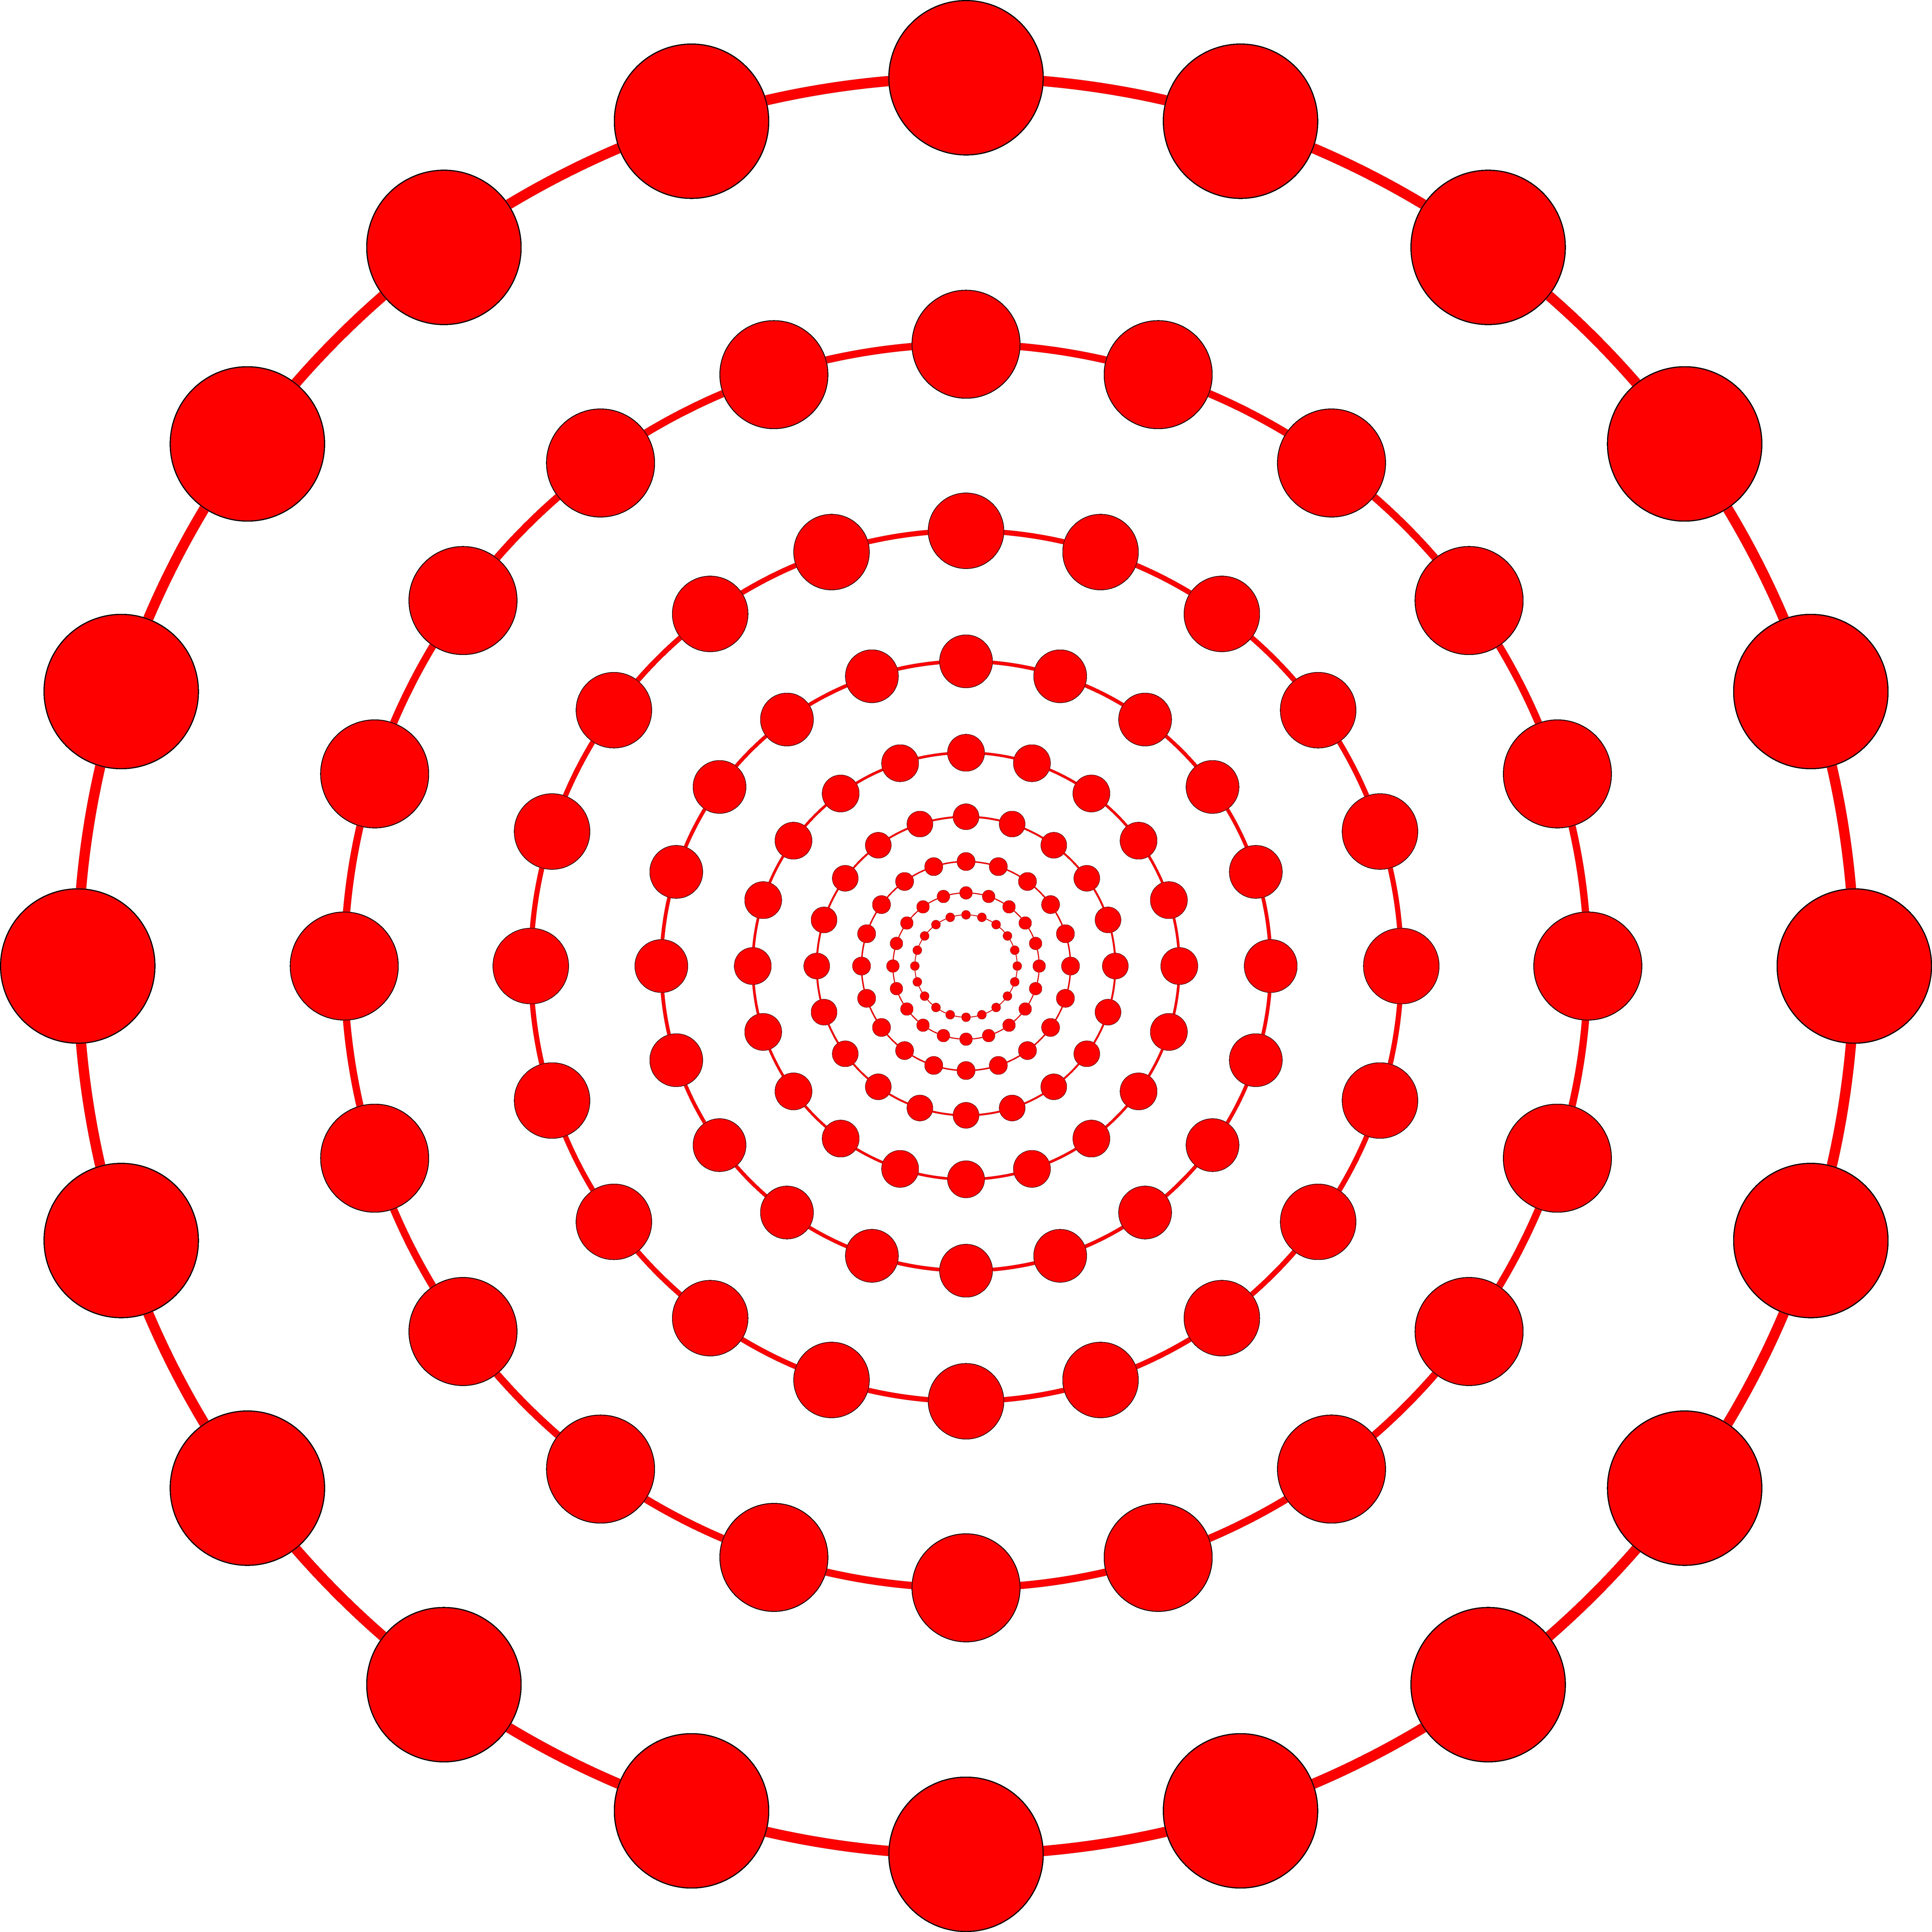 Dot2Circle